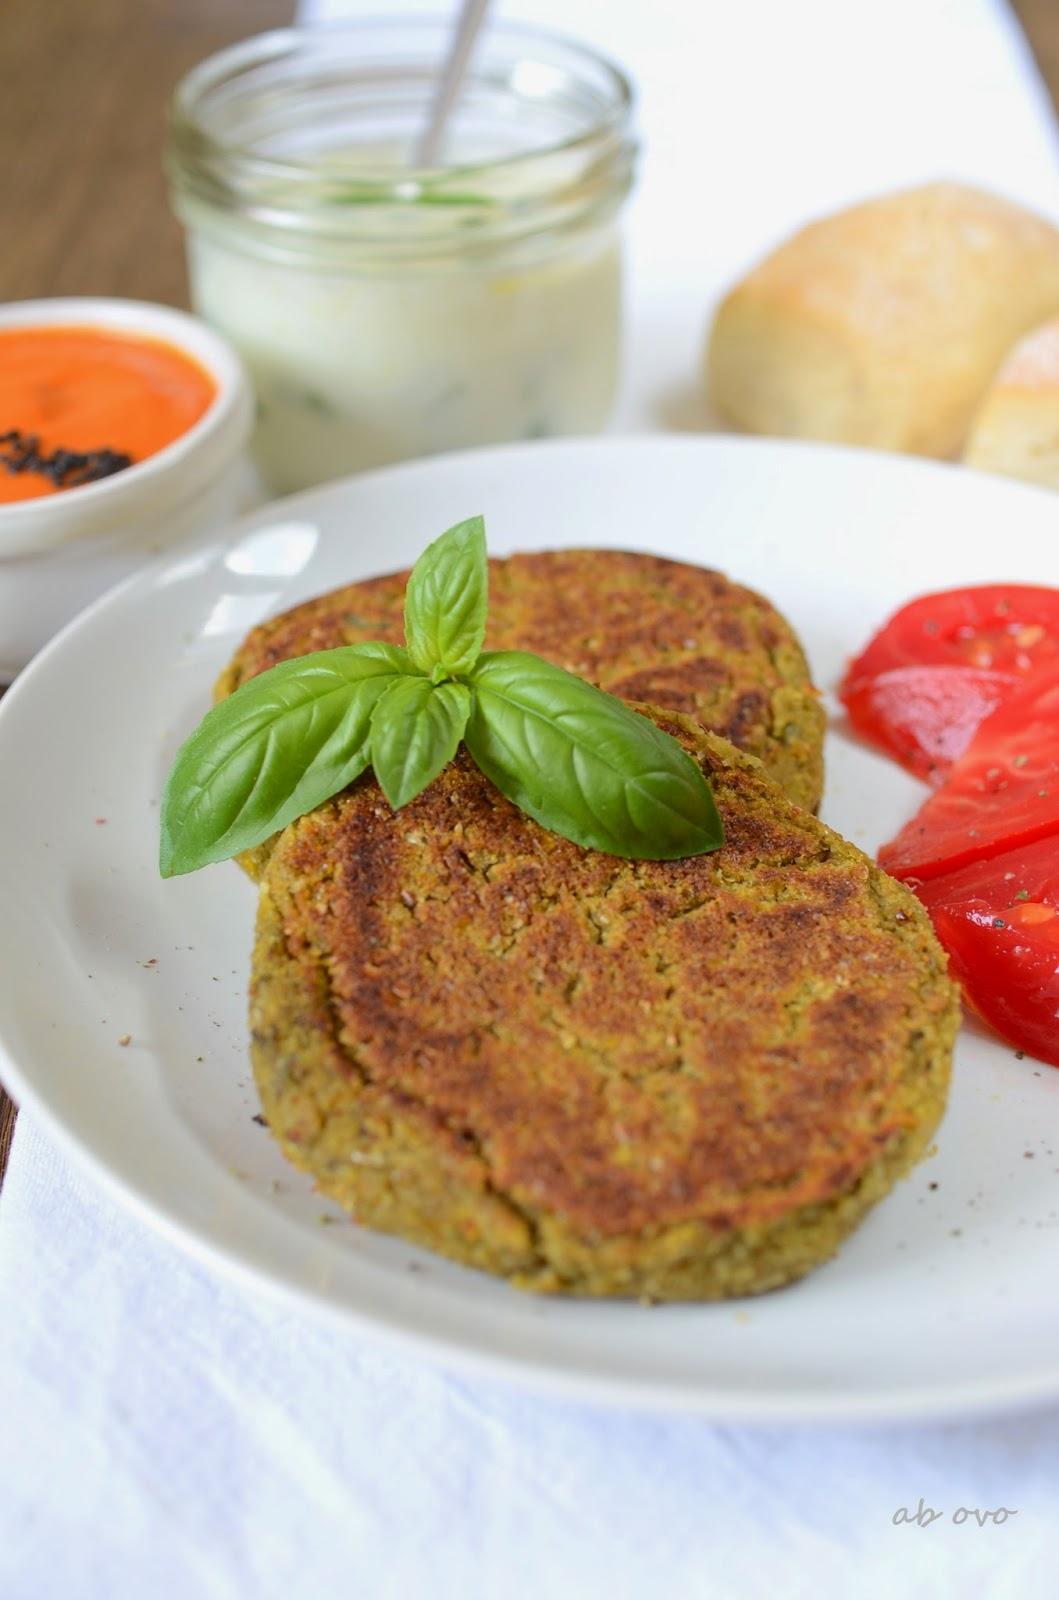 Burgers-vegani-di-azuki-verdi-al-basilico